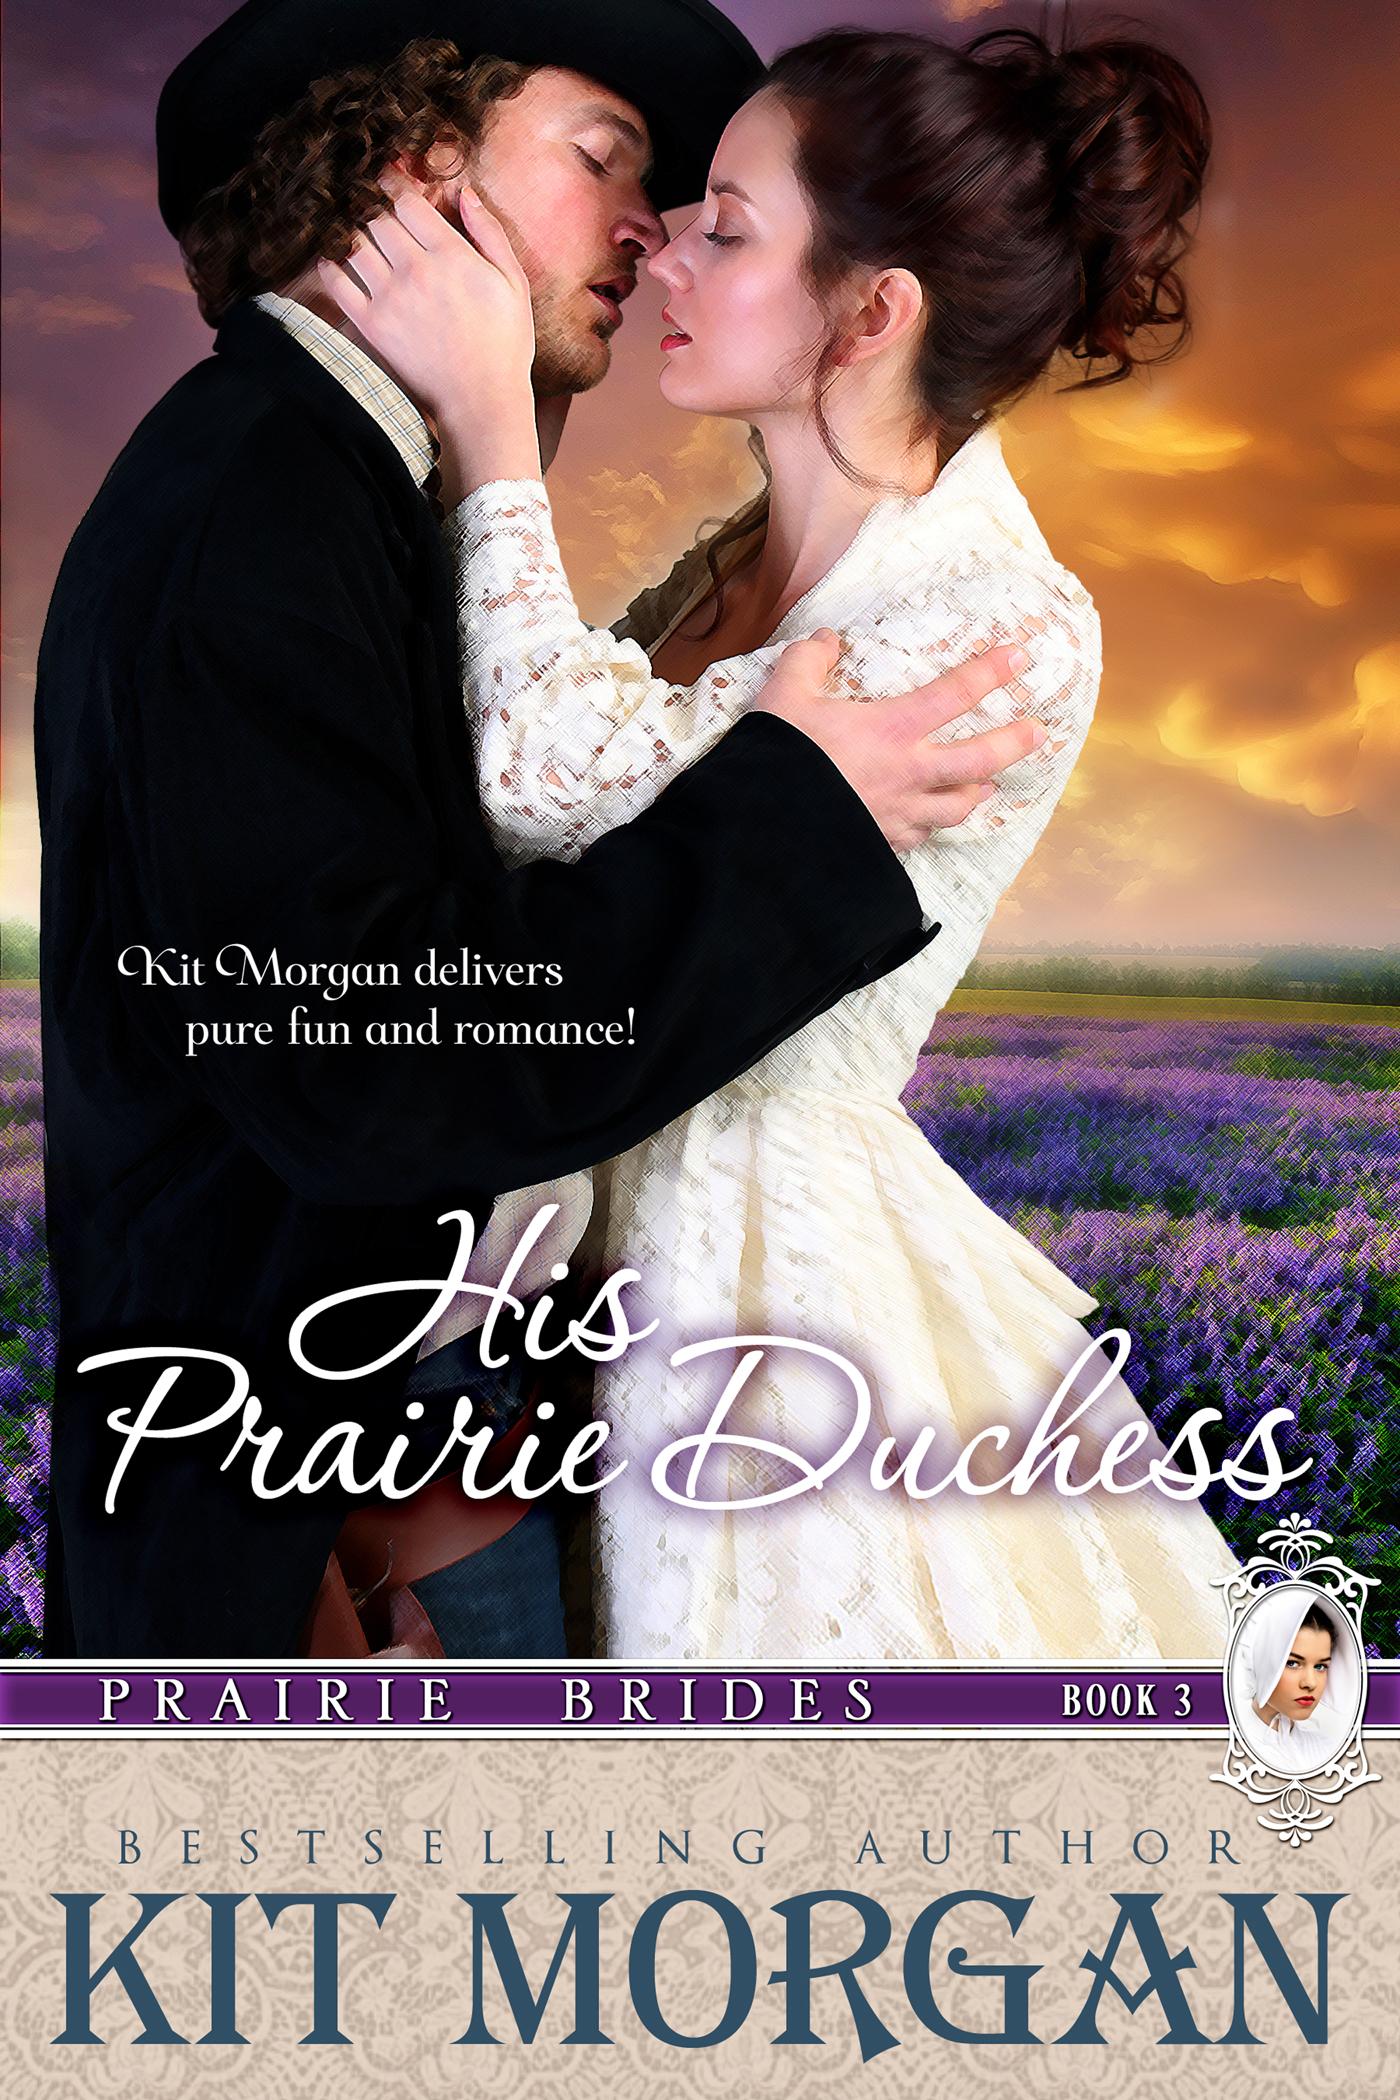 Prairie Brides Kit Morgan